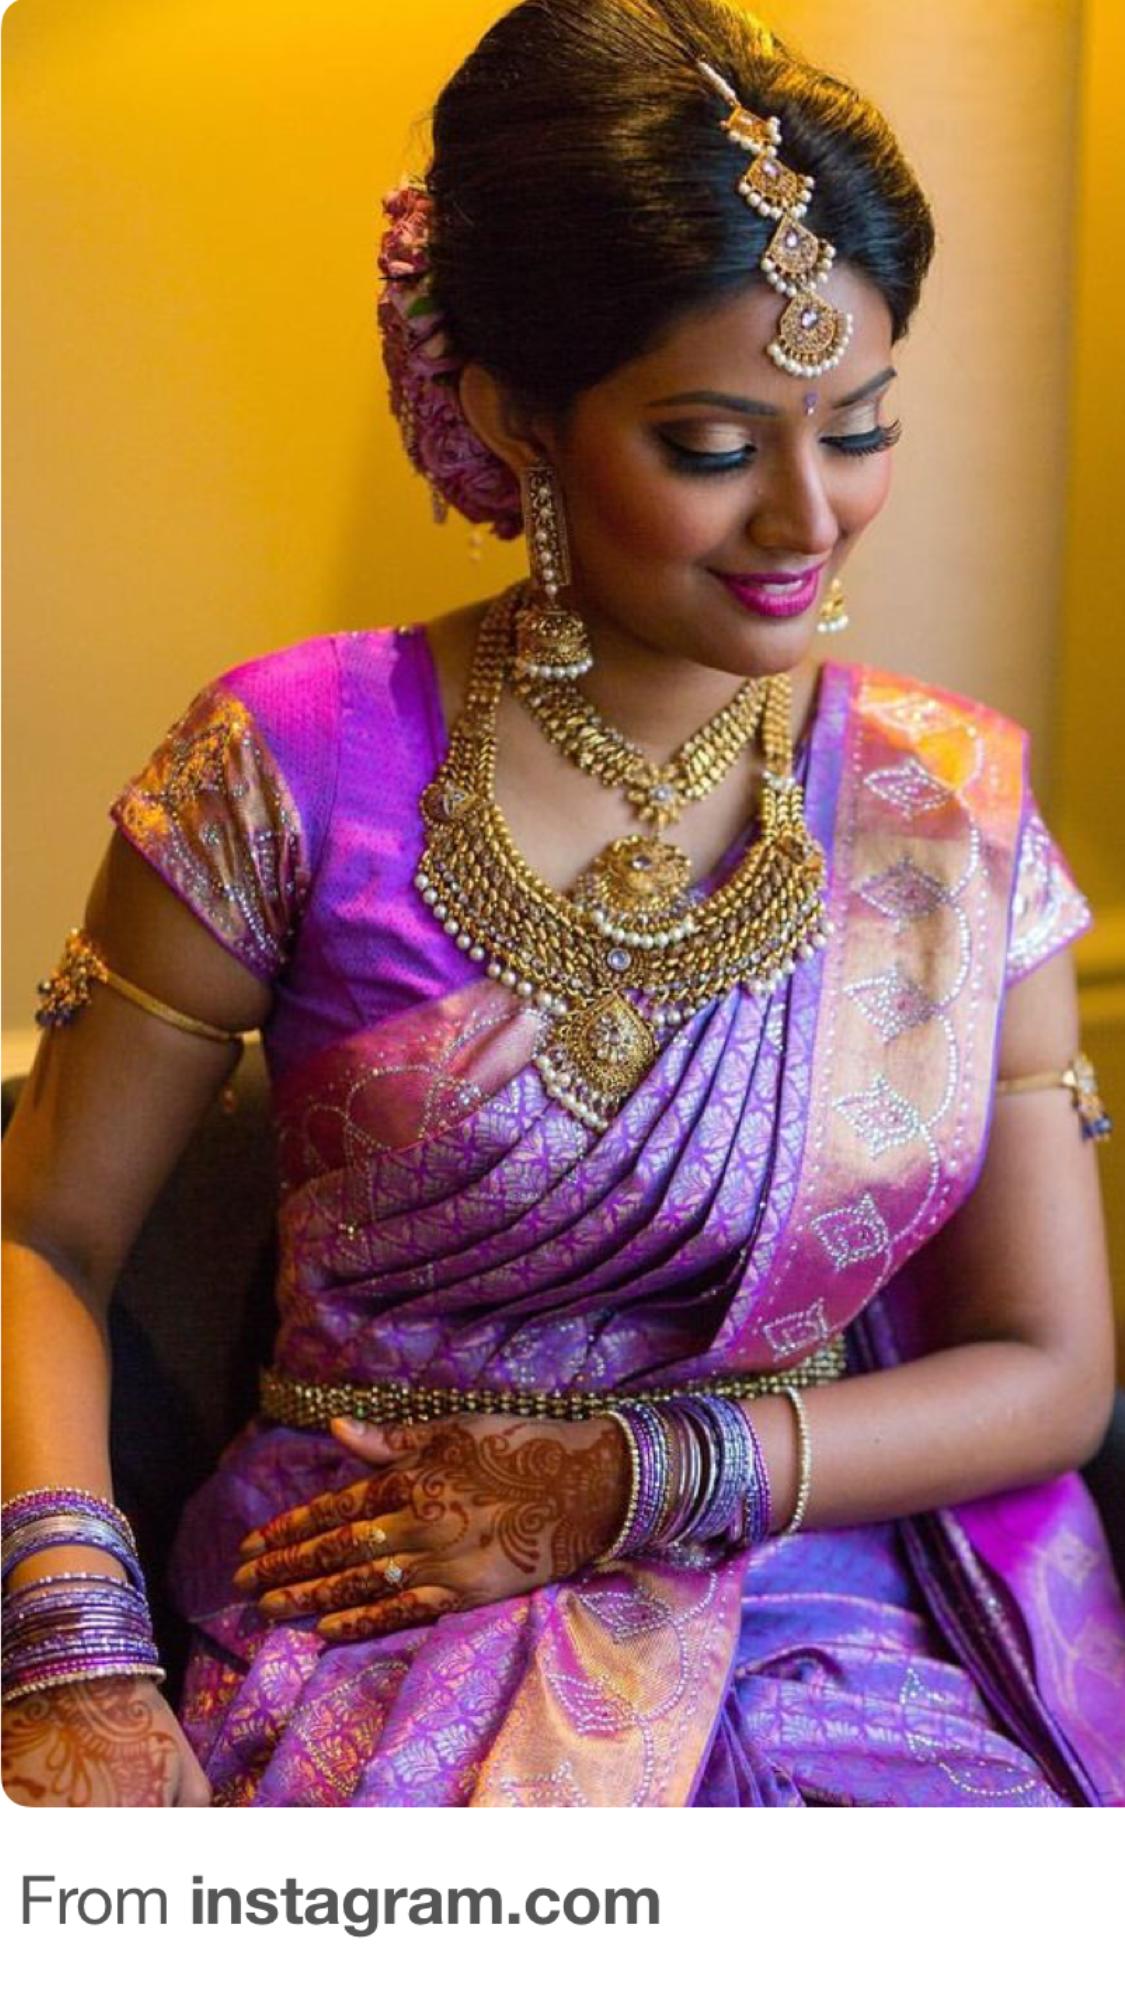 Pin de Shobha Patel en Shobha Patel   Pinterest